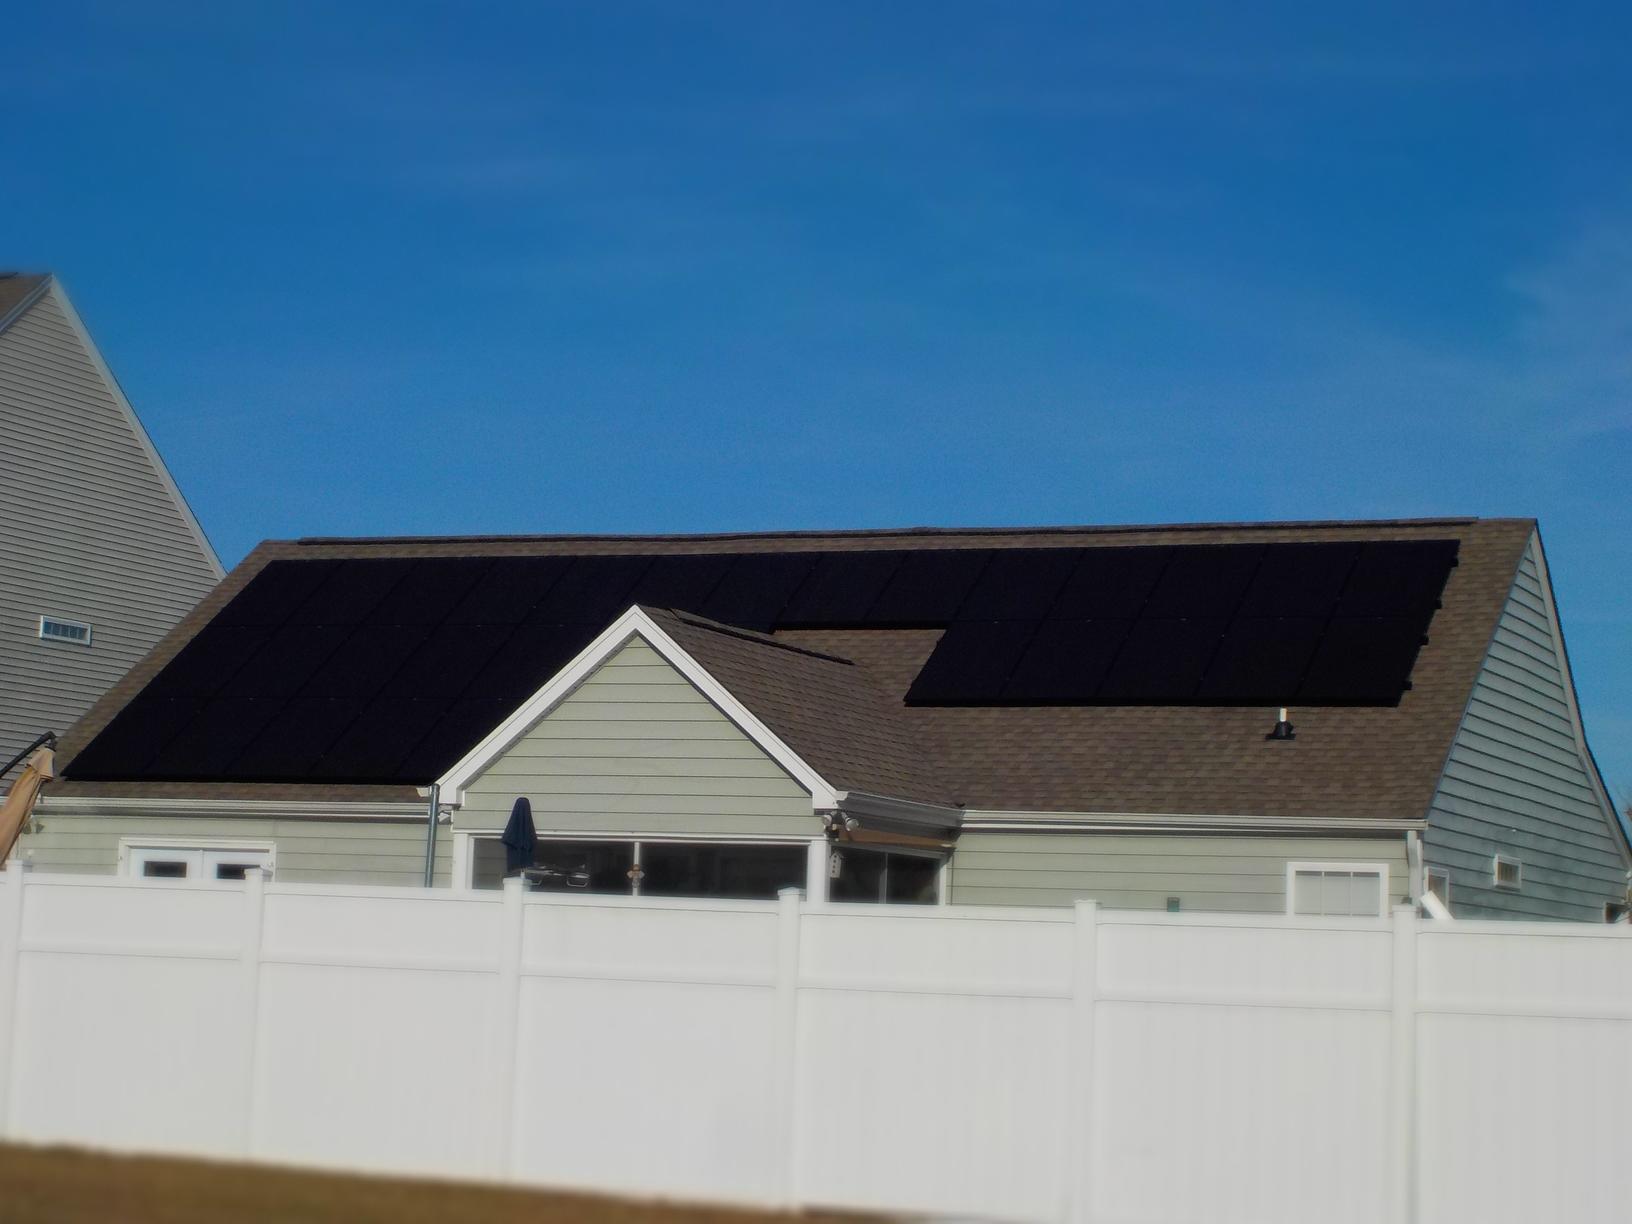 Solar Panel Galore in Myrtle Beach!